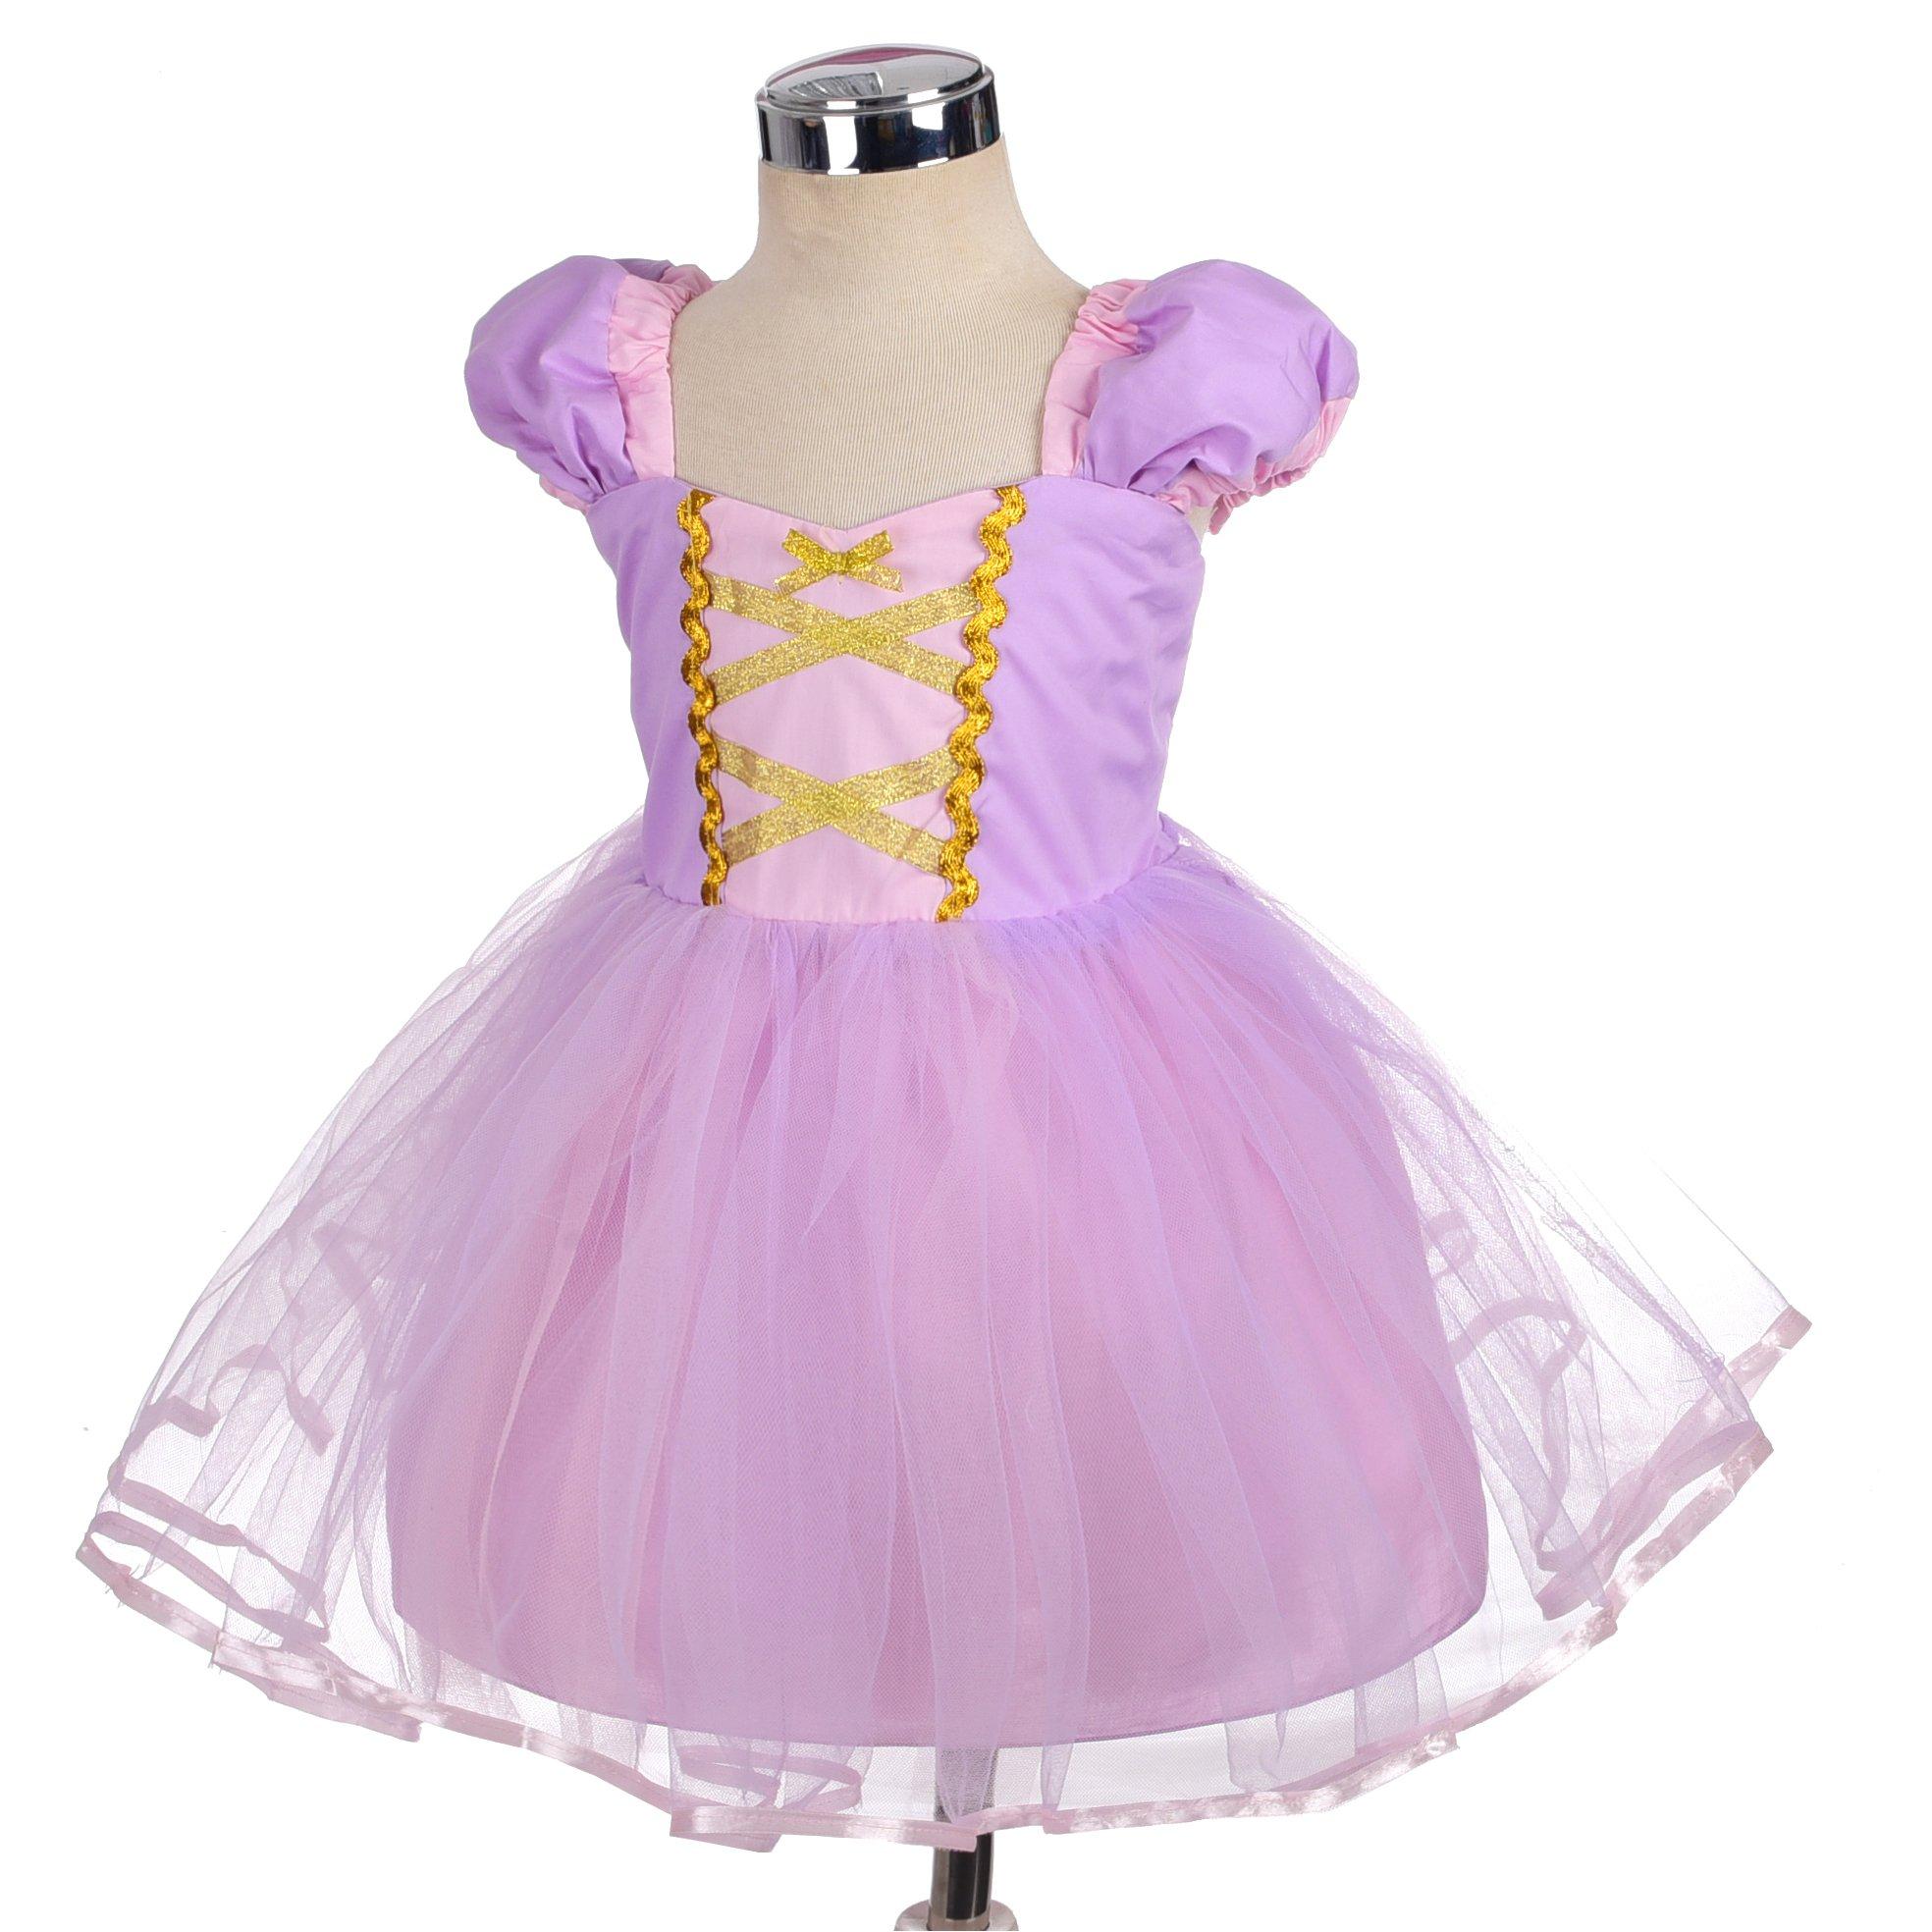 Dressy Daisy Girls Princess Rapunzel Dress Costumes for Toddler Girls Halloween Fancy Party Dress Size 4T by Dressy Daisy (Image #3)